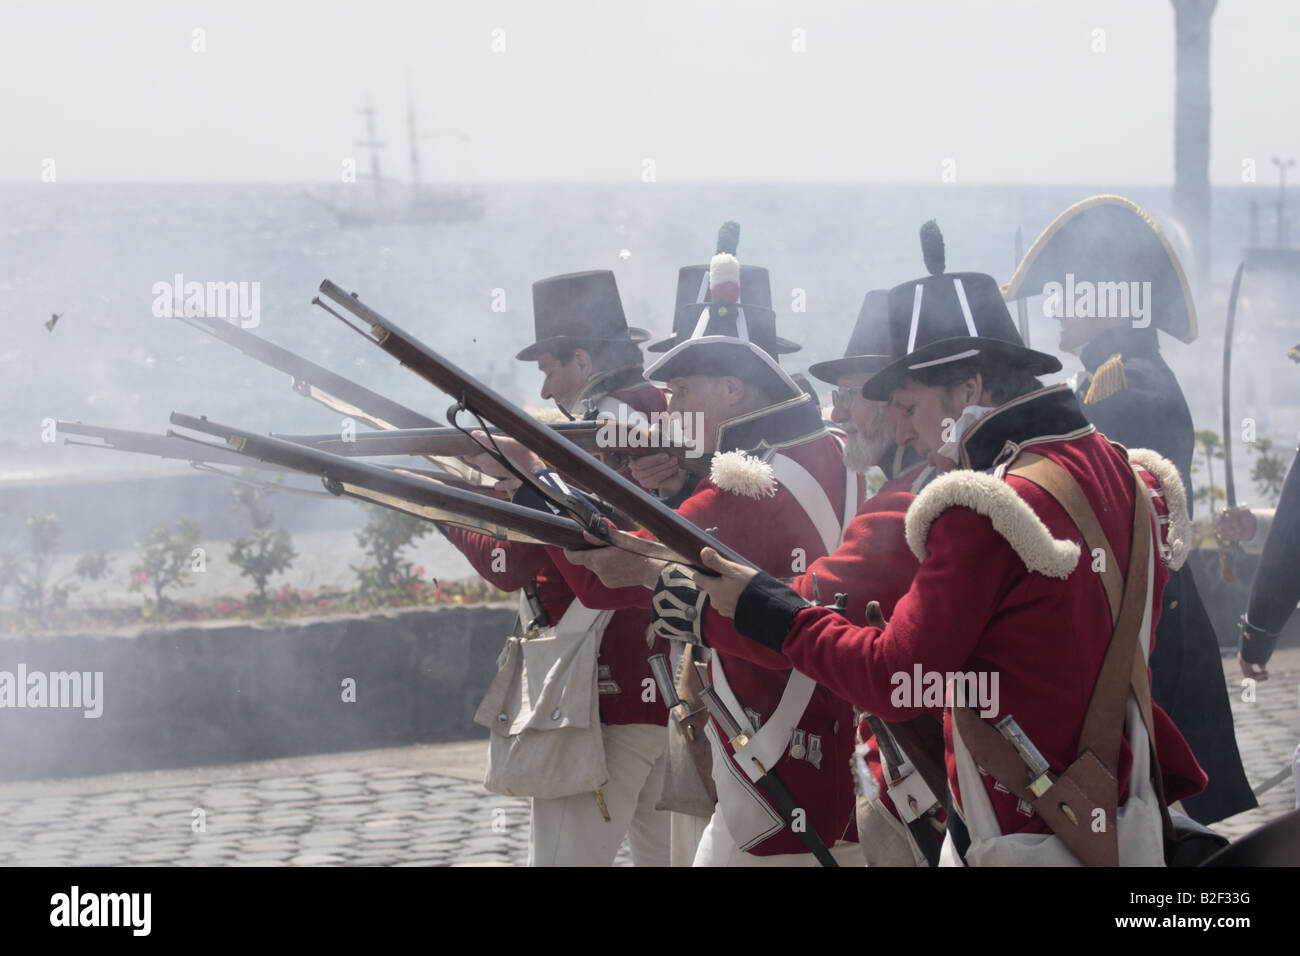 A group of British Royal Marine aiming and firing during a reenactment of the 1797 battle of Santa Cruz, Tenerife Stock Photo